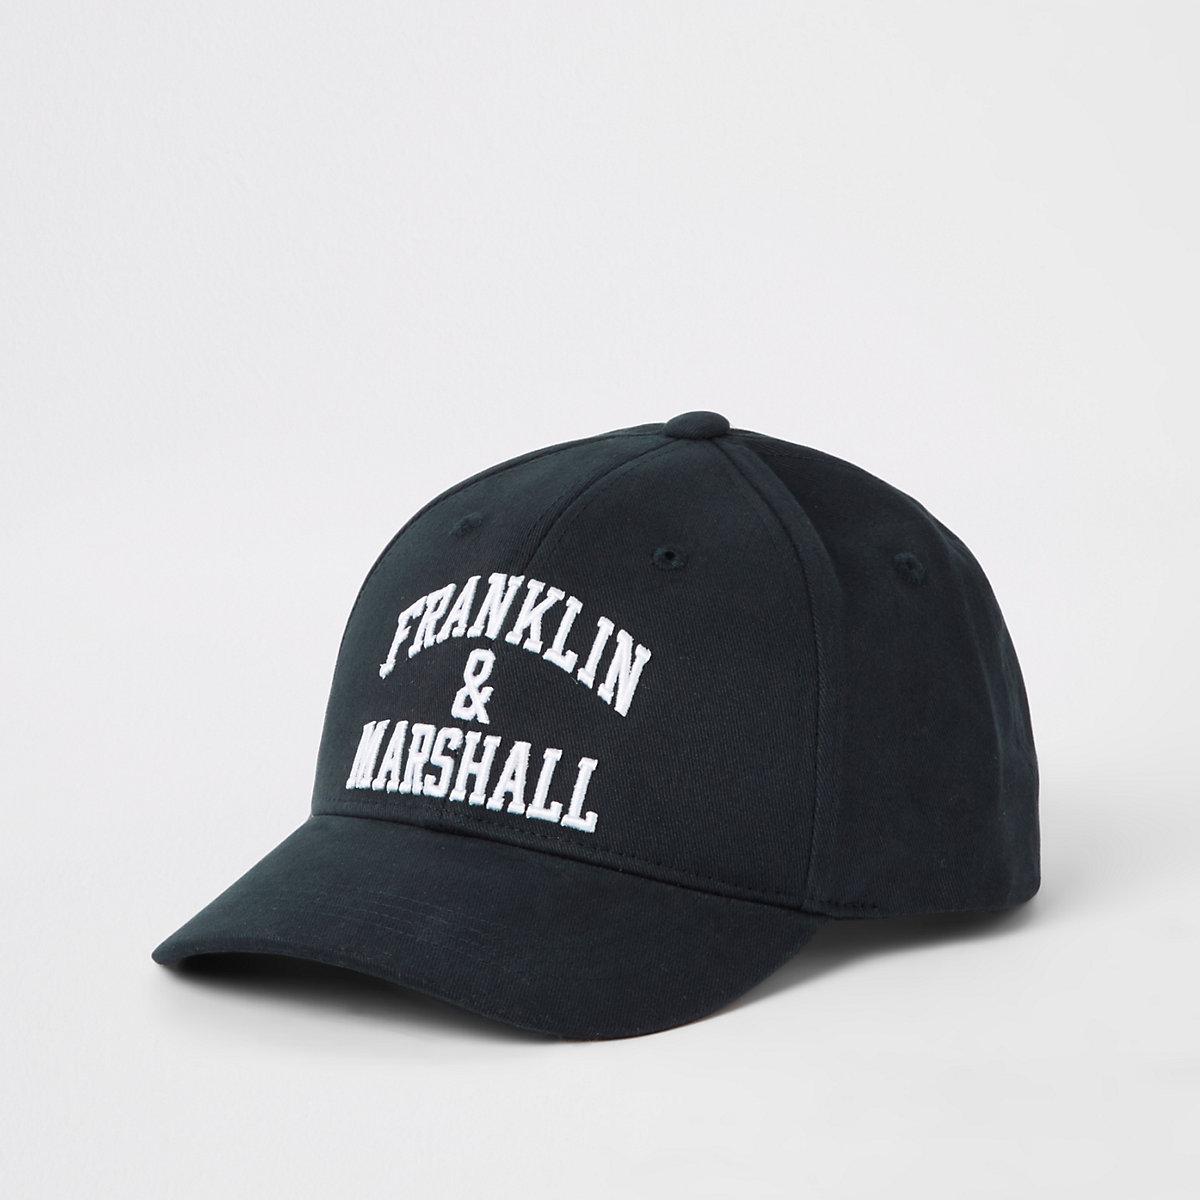 Boys Franklin and Marshall navy cap